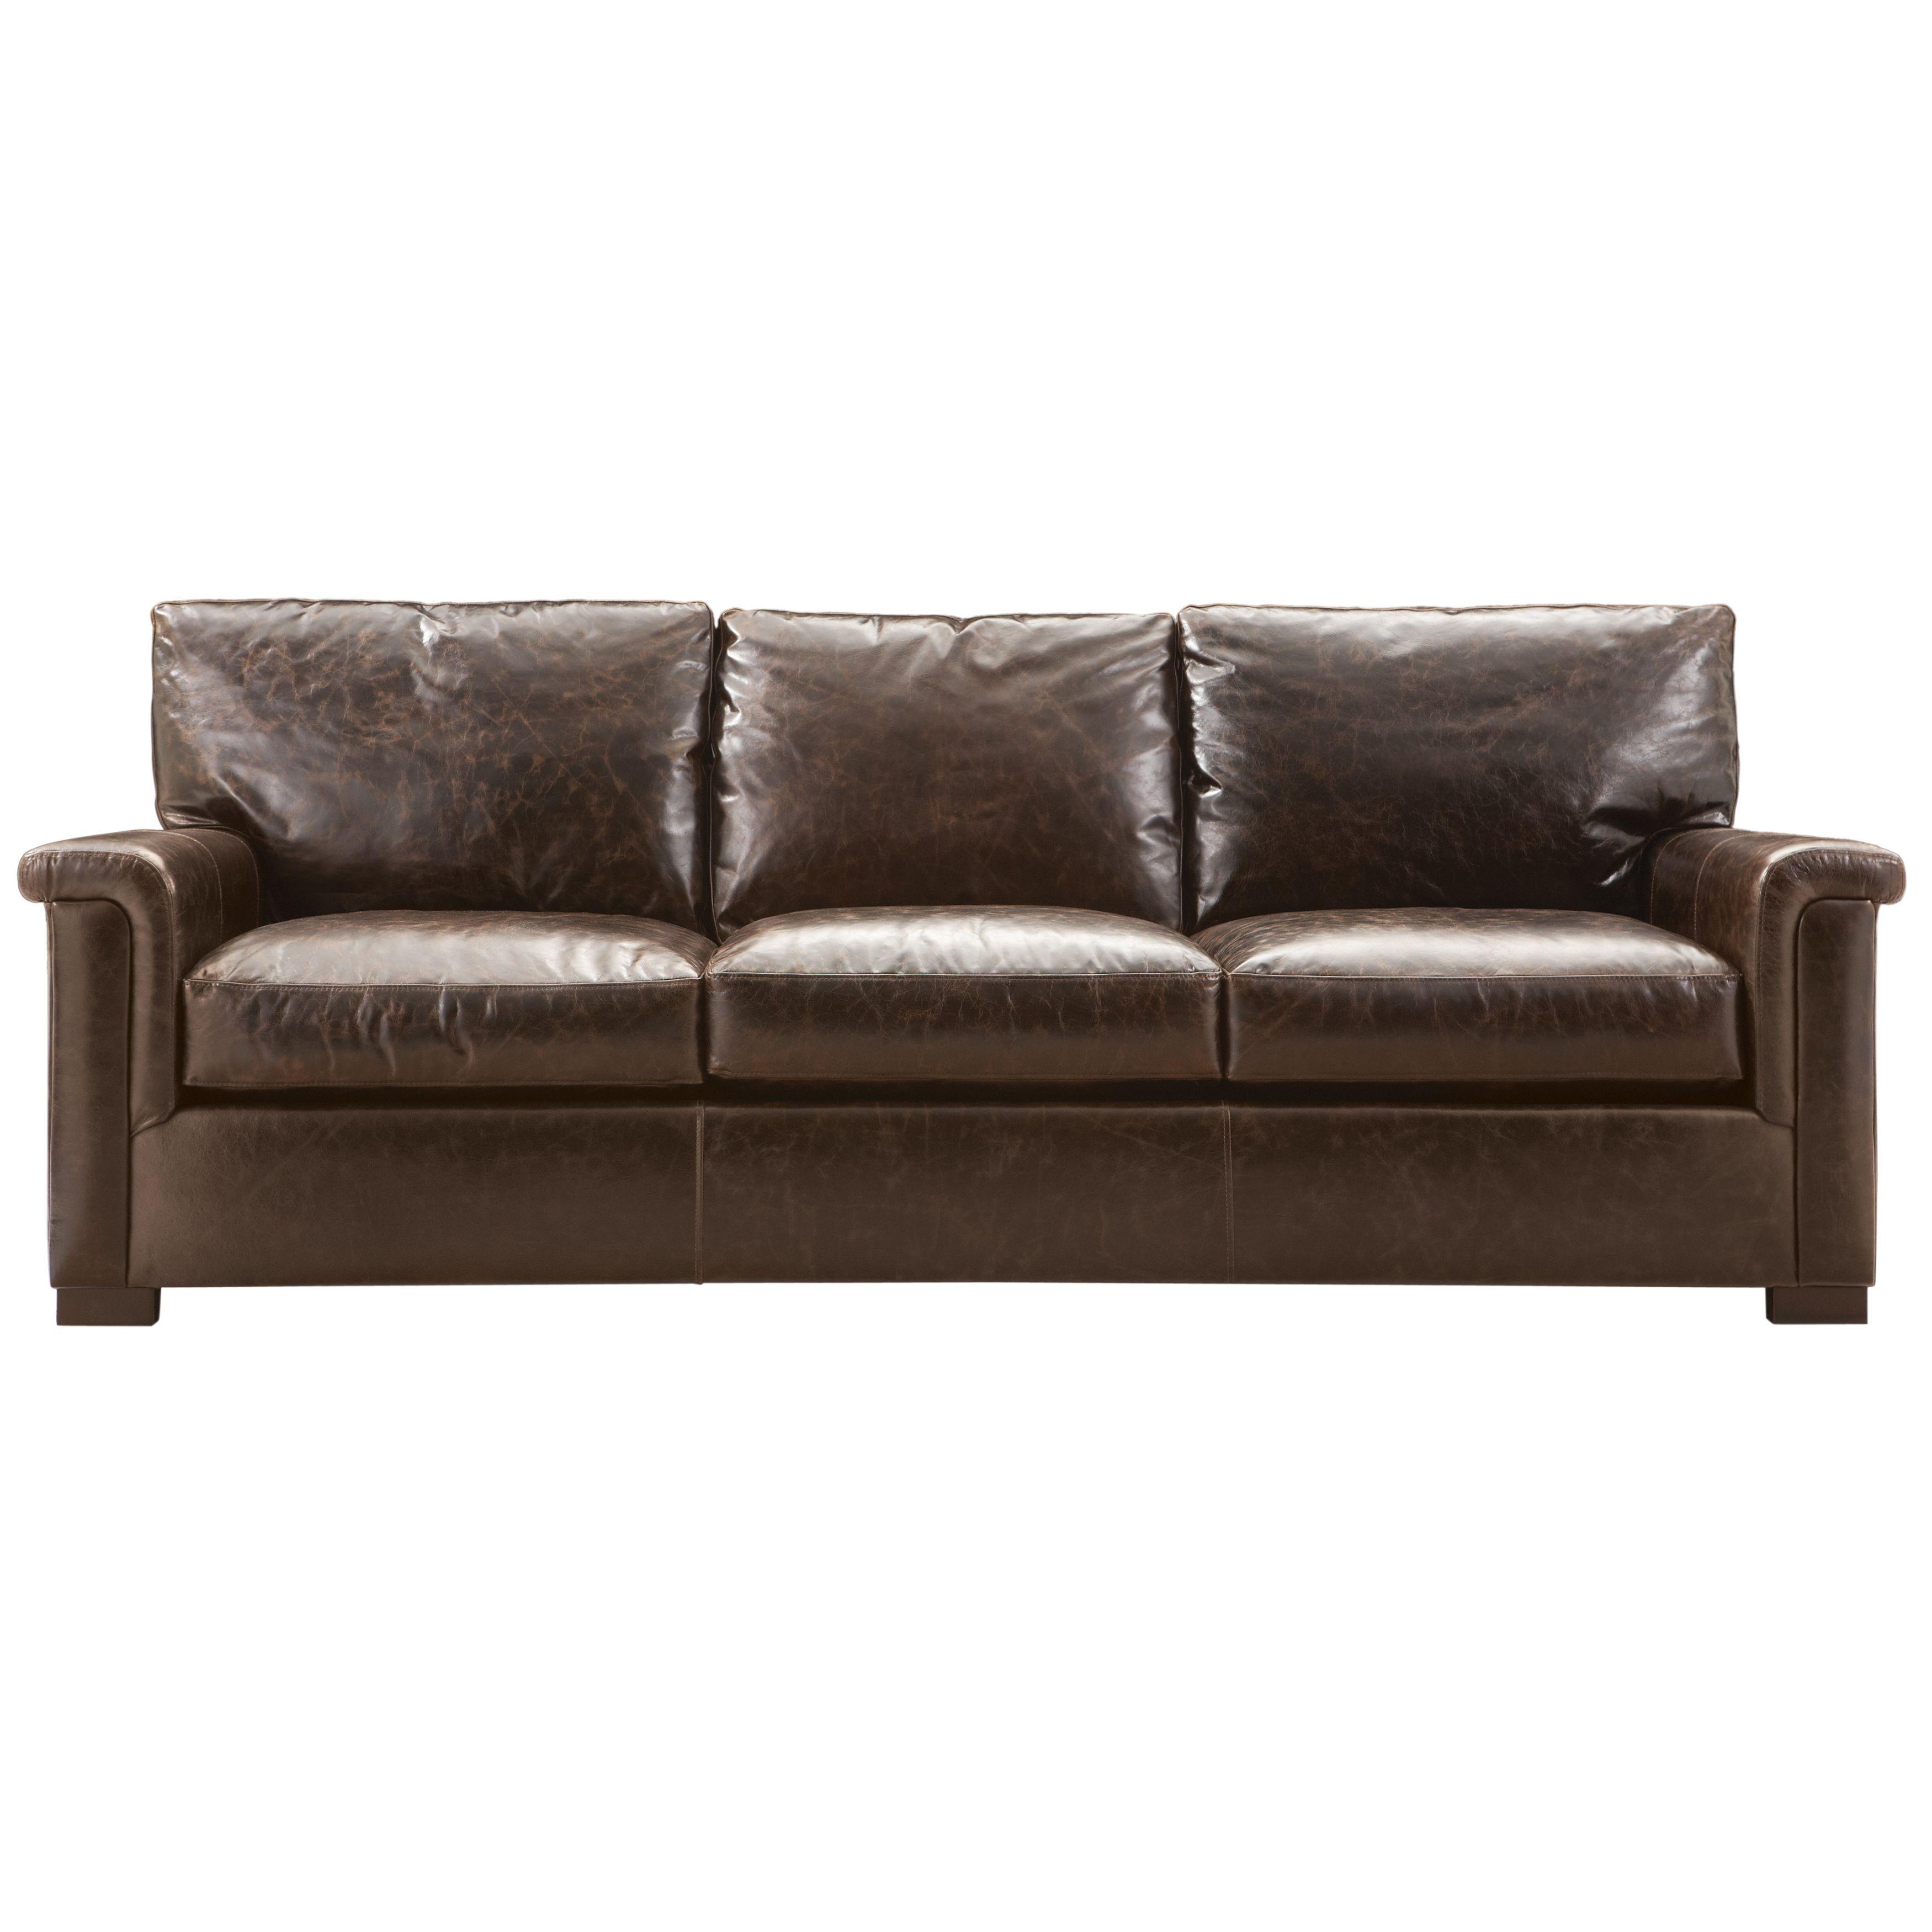 Super Art Van Foley 96 Sofa Overstock Shopping Great Deals Uwap Interior Chair Design Uwaporg